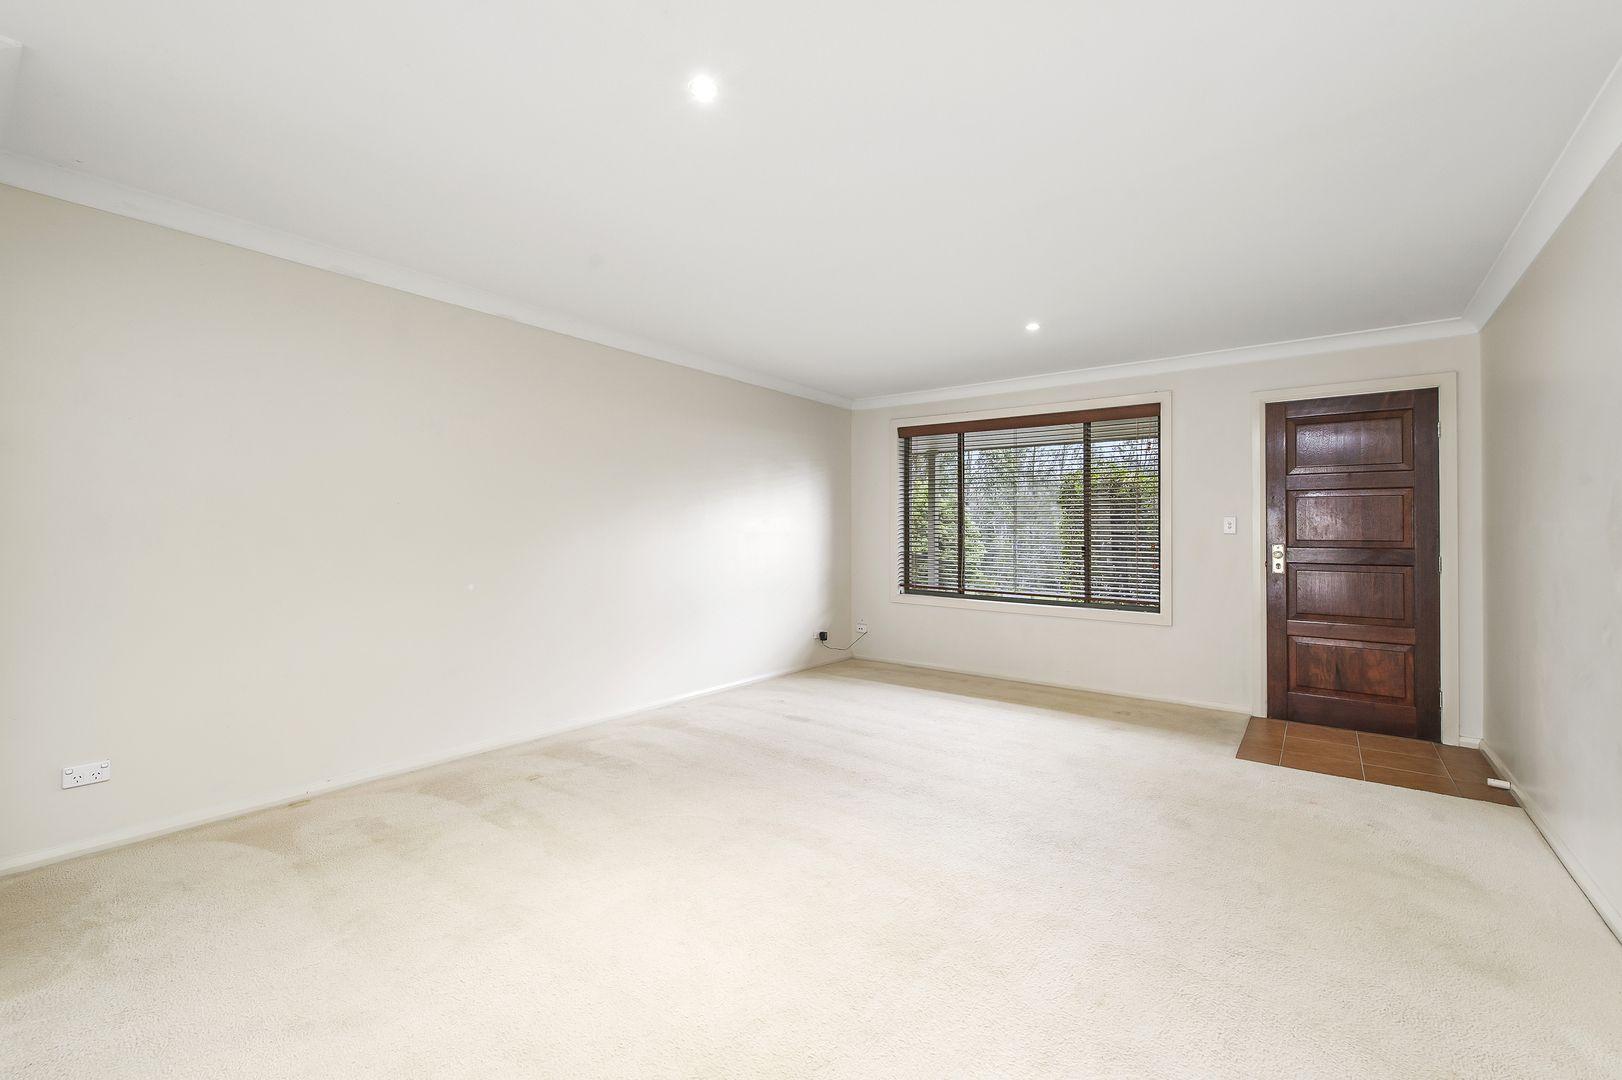 2/42 KOEL CRESCENT, Port Macquarie NSW 2444, Image 1